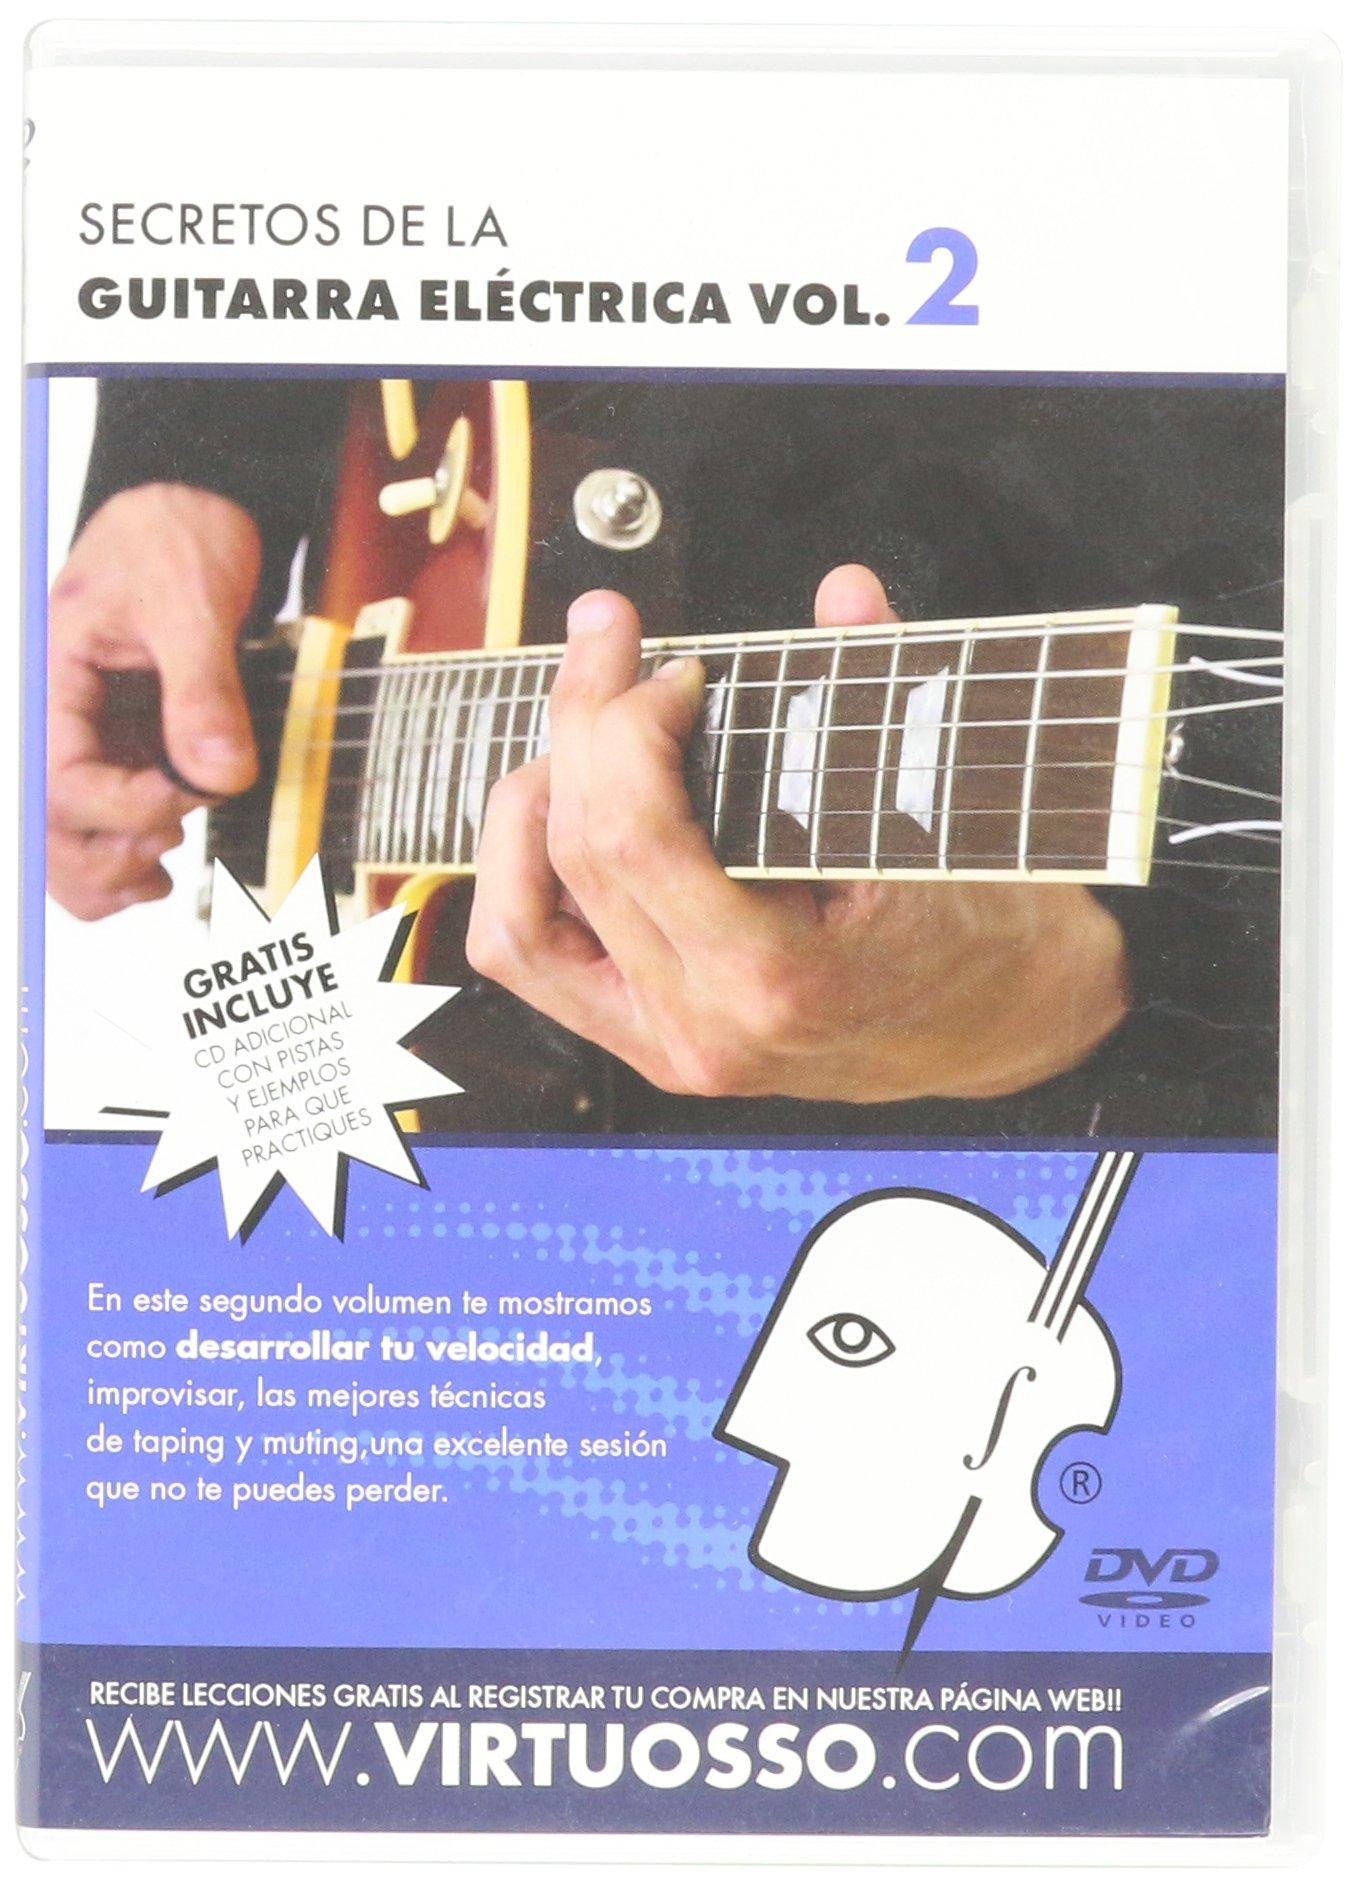 Virtuosso Electric Guitar Method Vol.2 (Curso De Guitarra Eléctrica Vol.2) SPANISH ONLY by Virtuosso